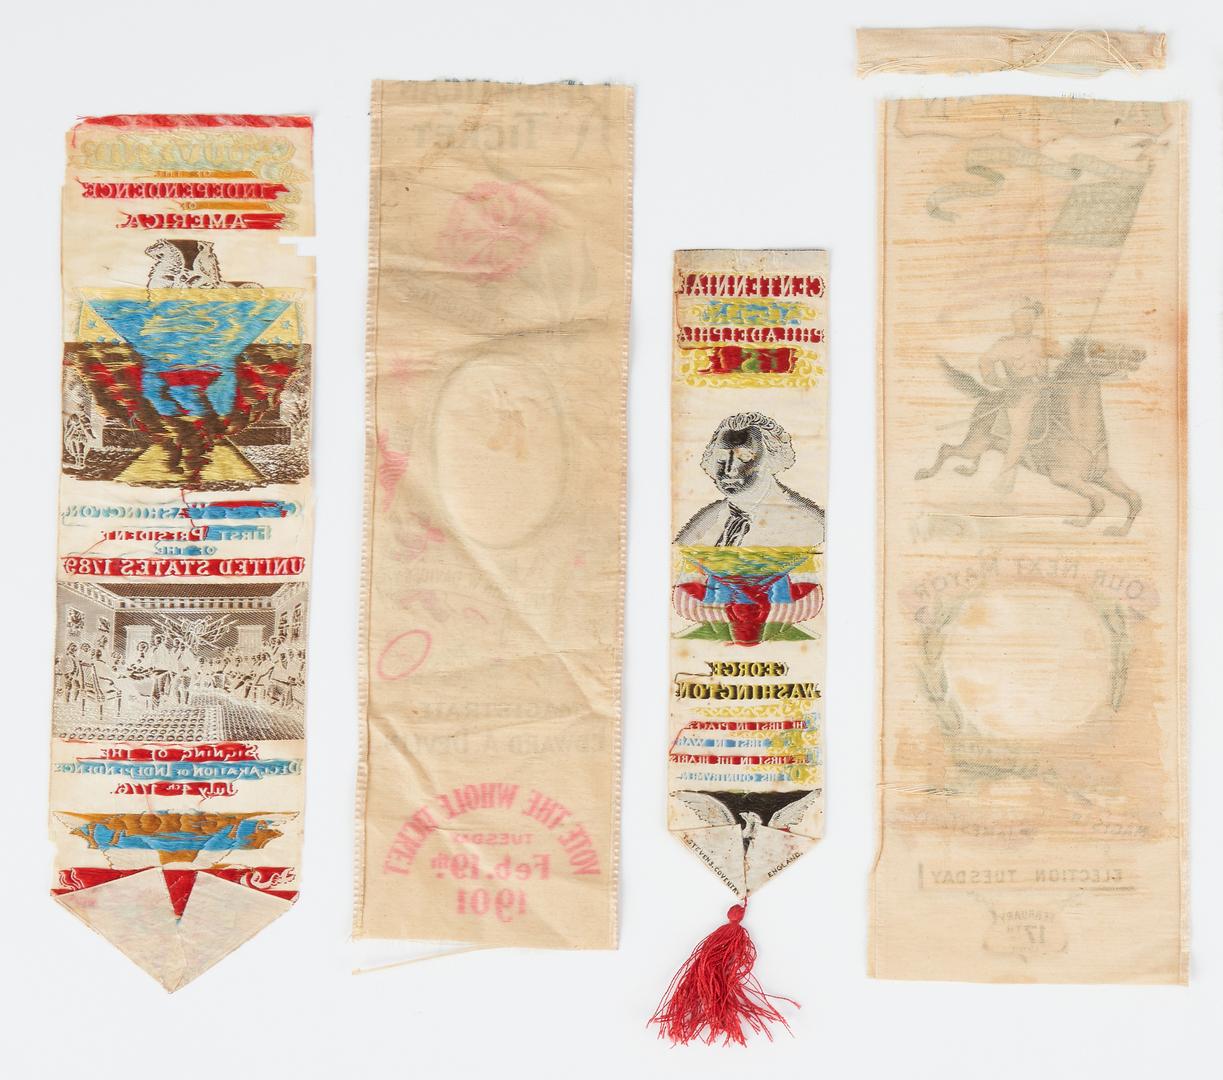 Lot 668: 9 Political Ribbons, including Louisiana Purchase, Washington, GOP